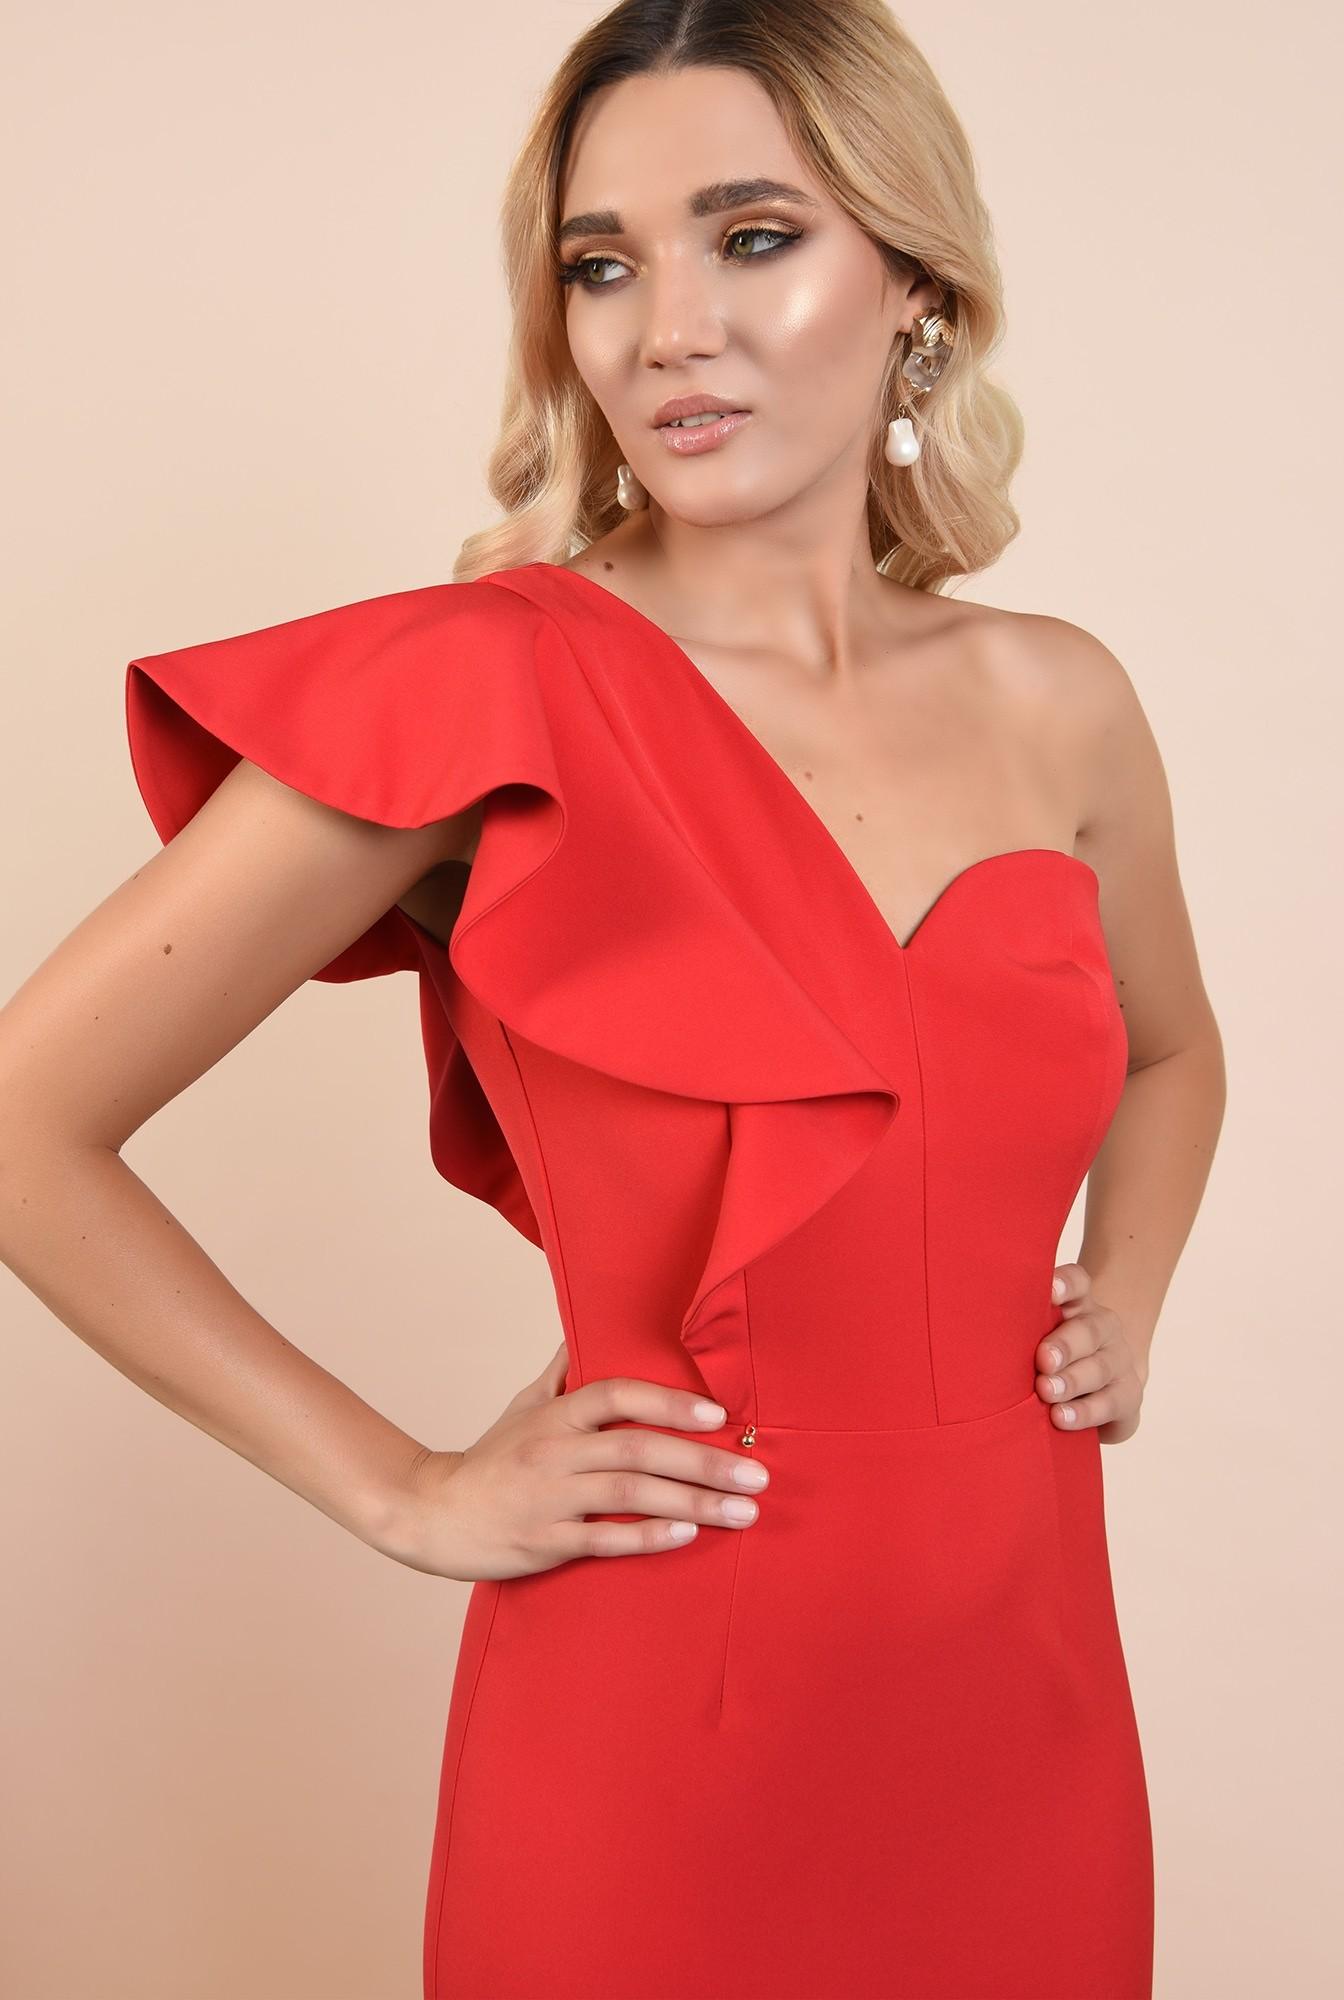 2 - 360 - rochie rosie, de ocazie, midi, conica, decolteu inima